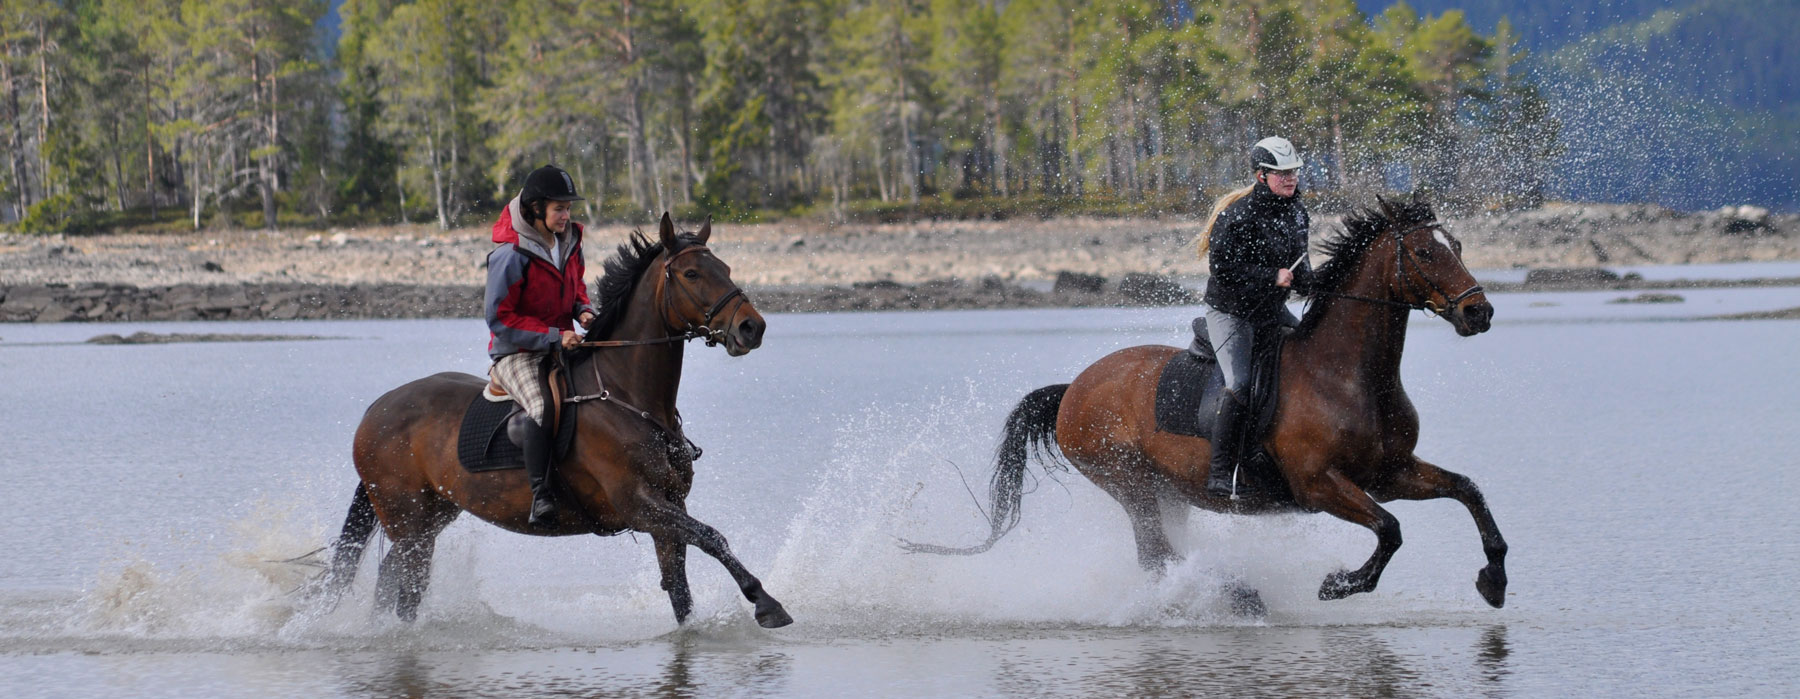 Ridesenteret i Rauland (Horseback Riding Centre)